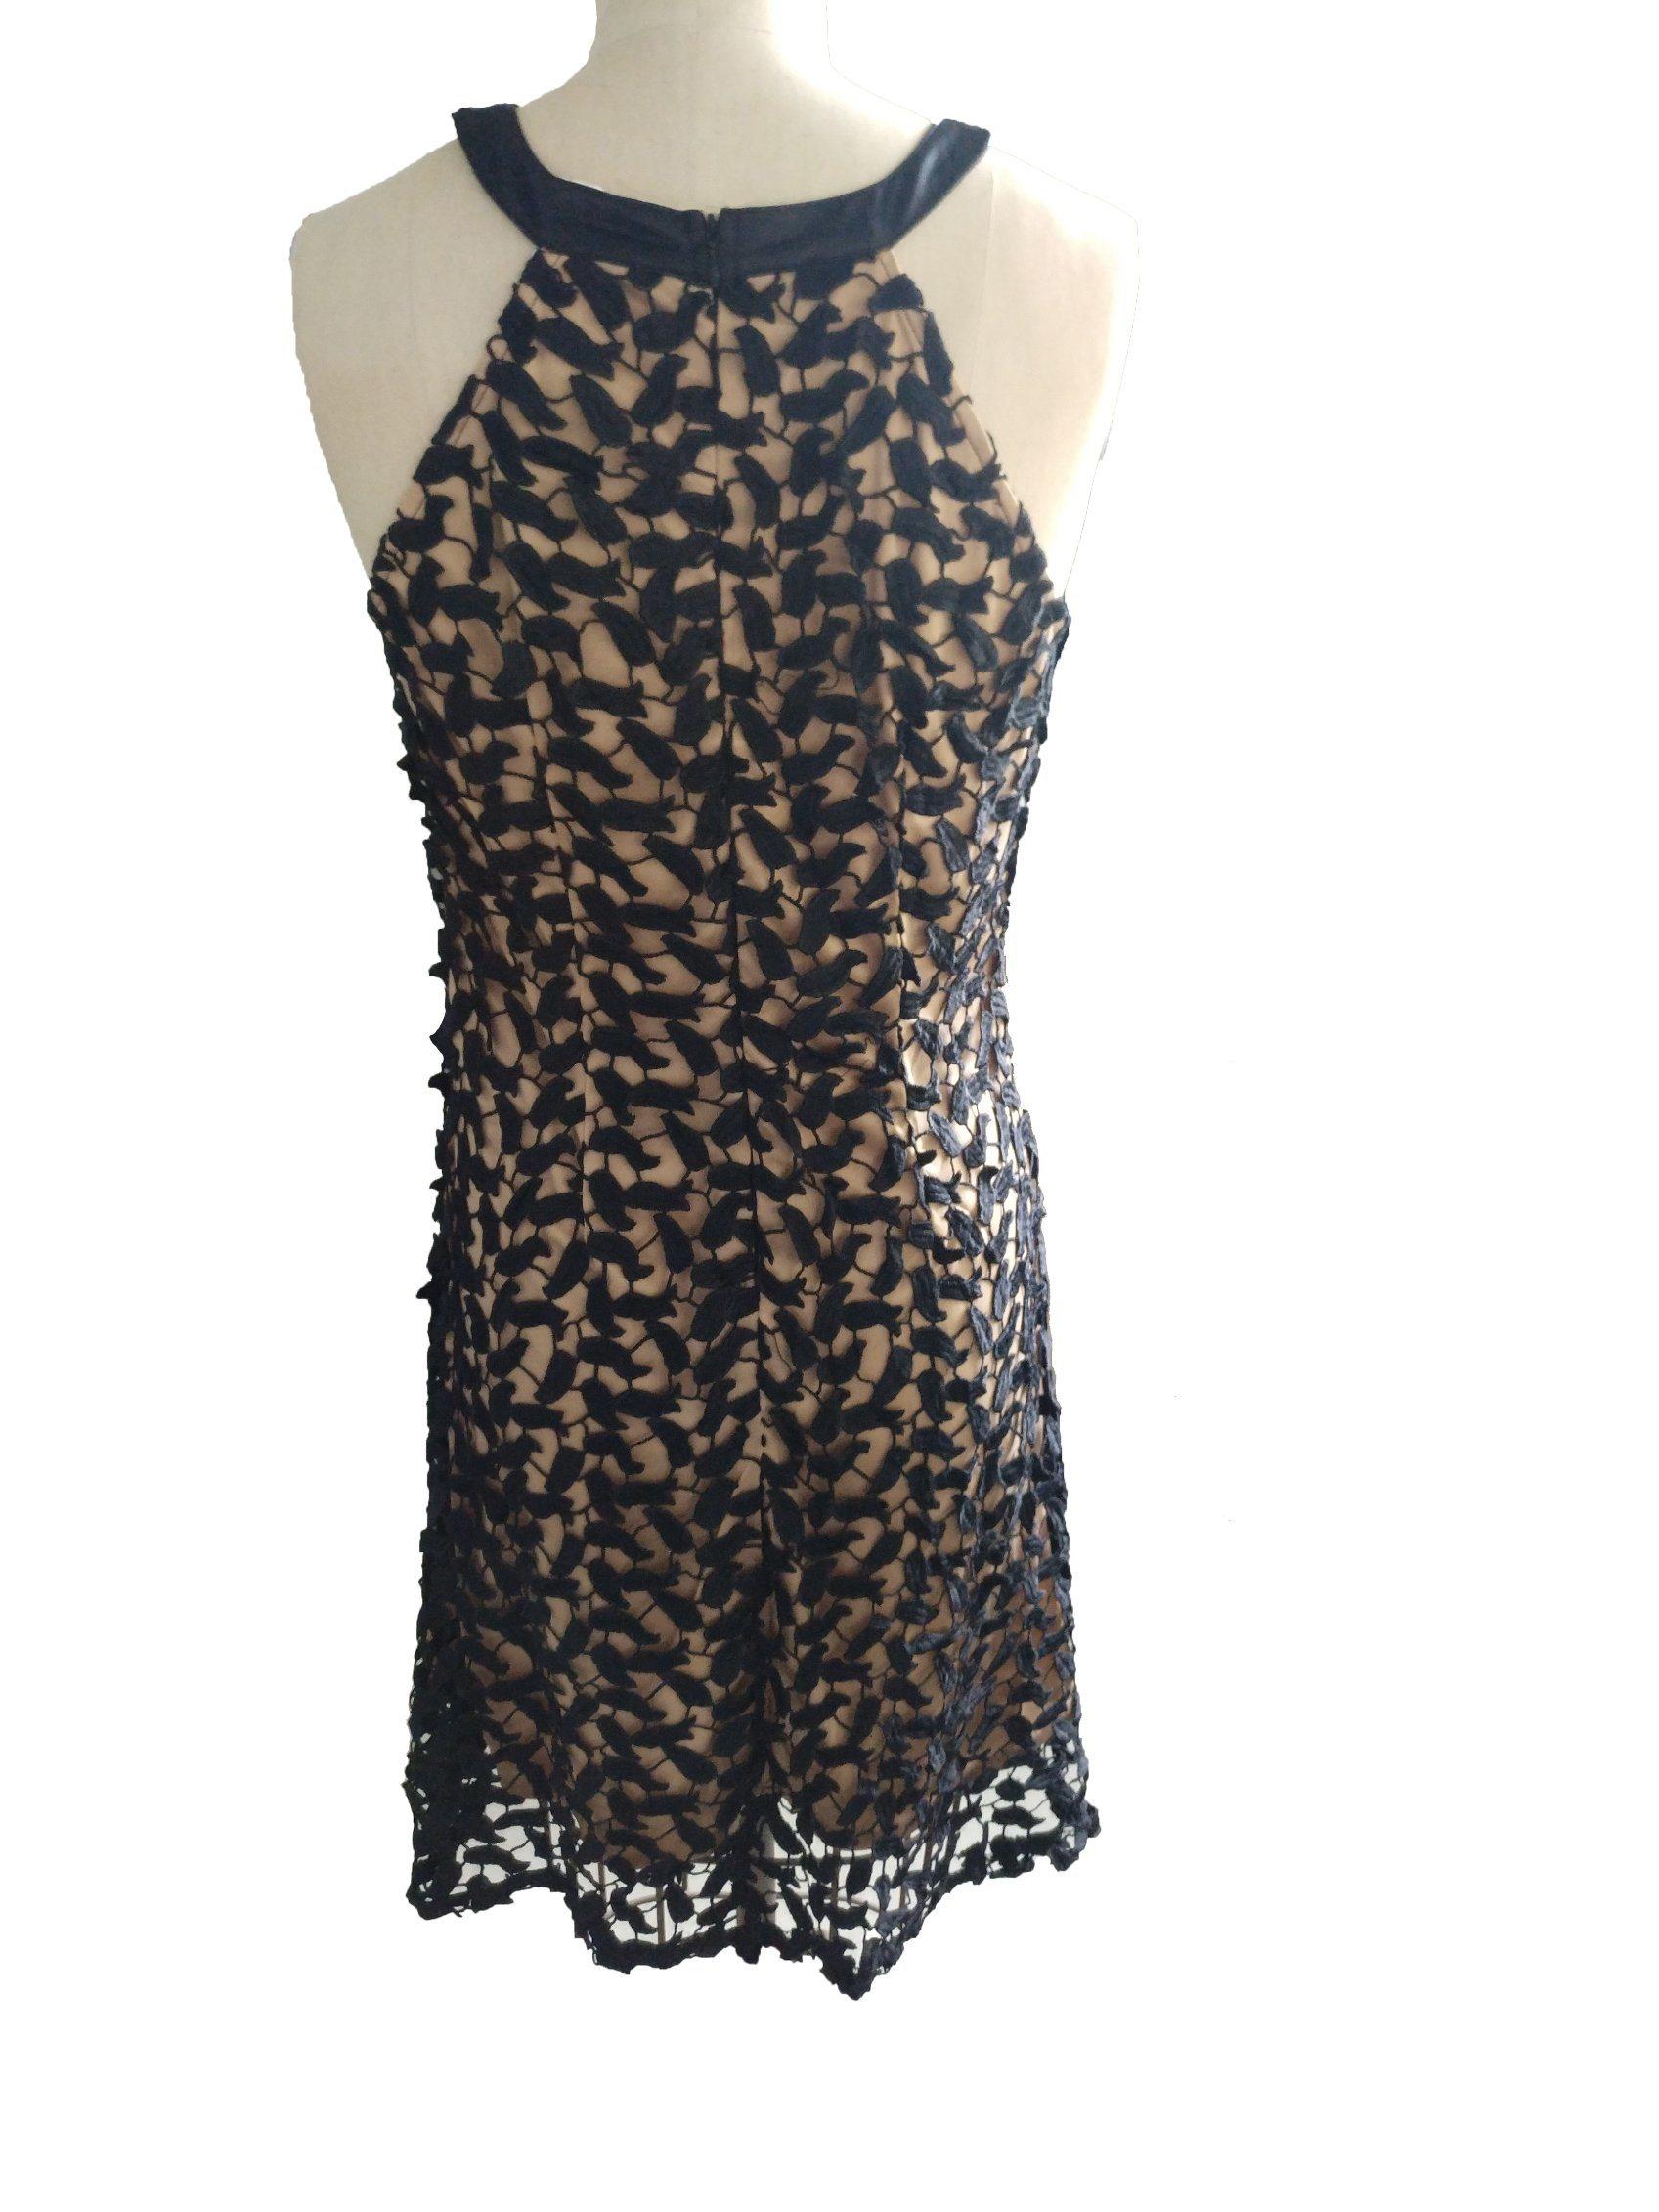 Newest Fahshion Jacquard Lace Sleeveless Round Neck Women′s Dress